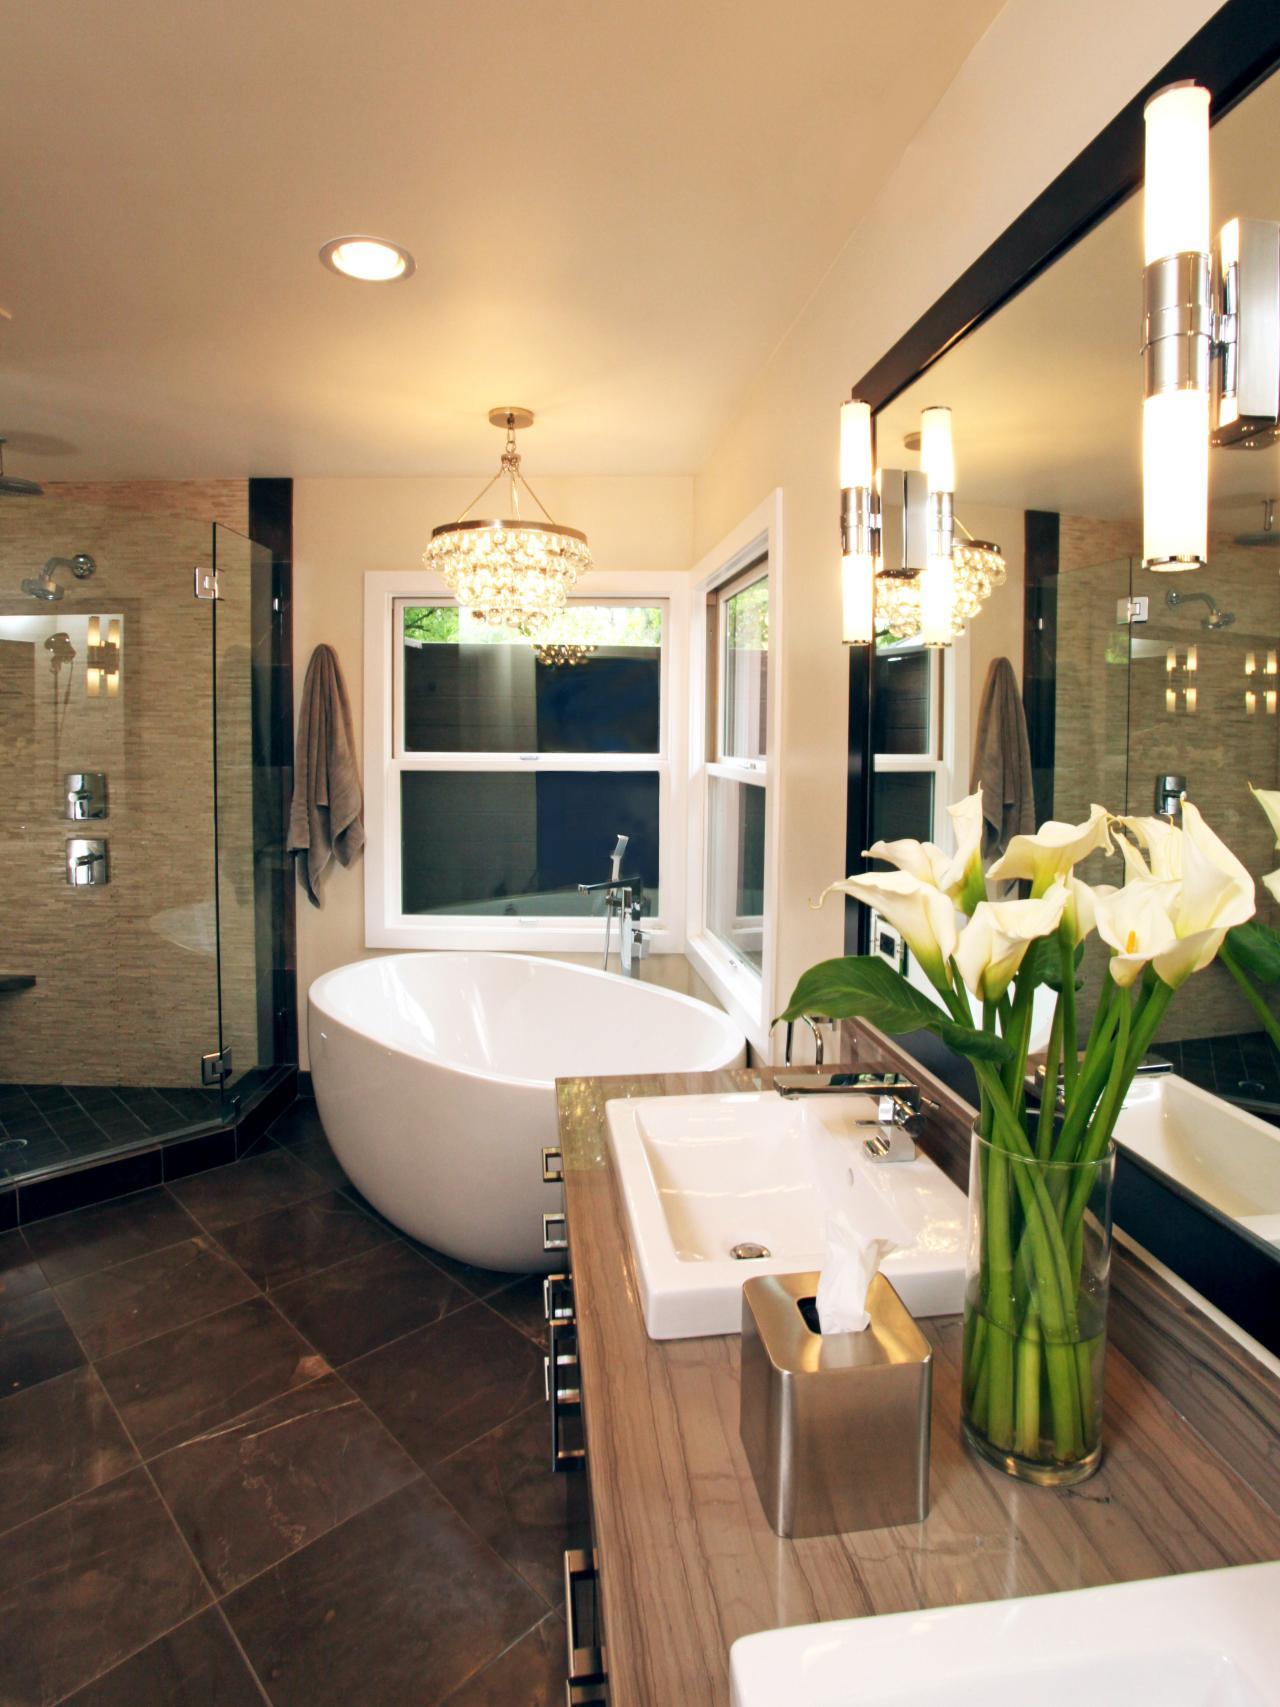 20 Luxurious Bathrooms with Elegant Chandelier Lighting on Bathroom Apartment Ideas  id=53400